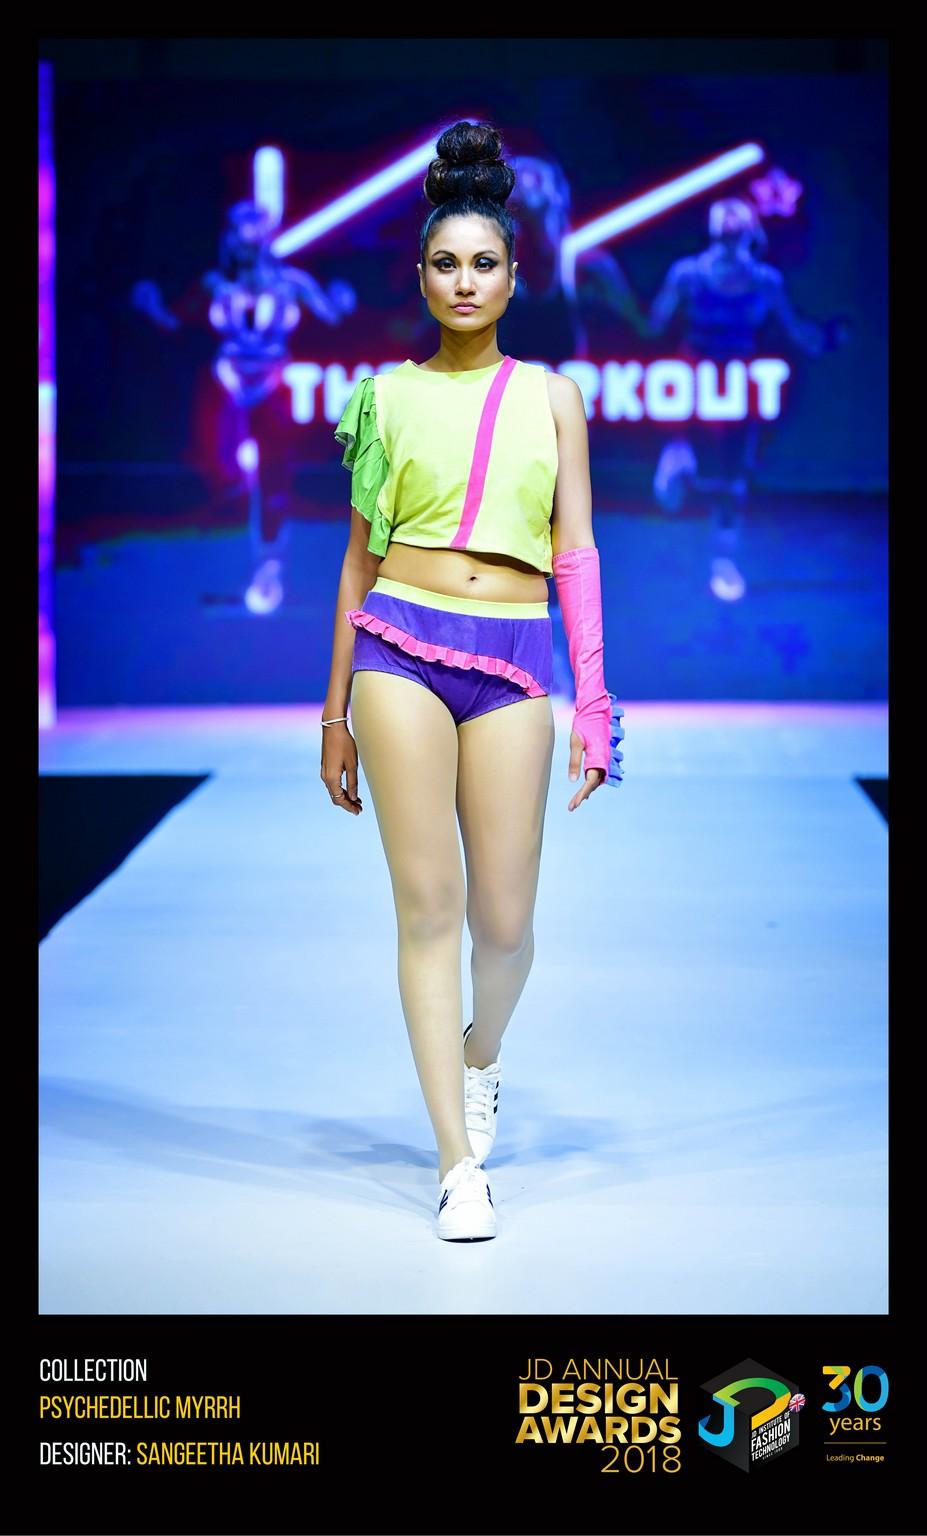 Psychedelic Myrrh – Change – JD Annual Design Awards 2018 | Designer: Sangeetha Kumari | Photography : Jerin Nath (@jerin_nath) psychedelic myrrh - PSYCHEDELLIC MYRRH - Psychedelic Myrrh – Change – JD Annual Design Awards 2018